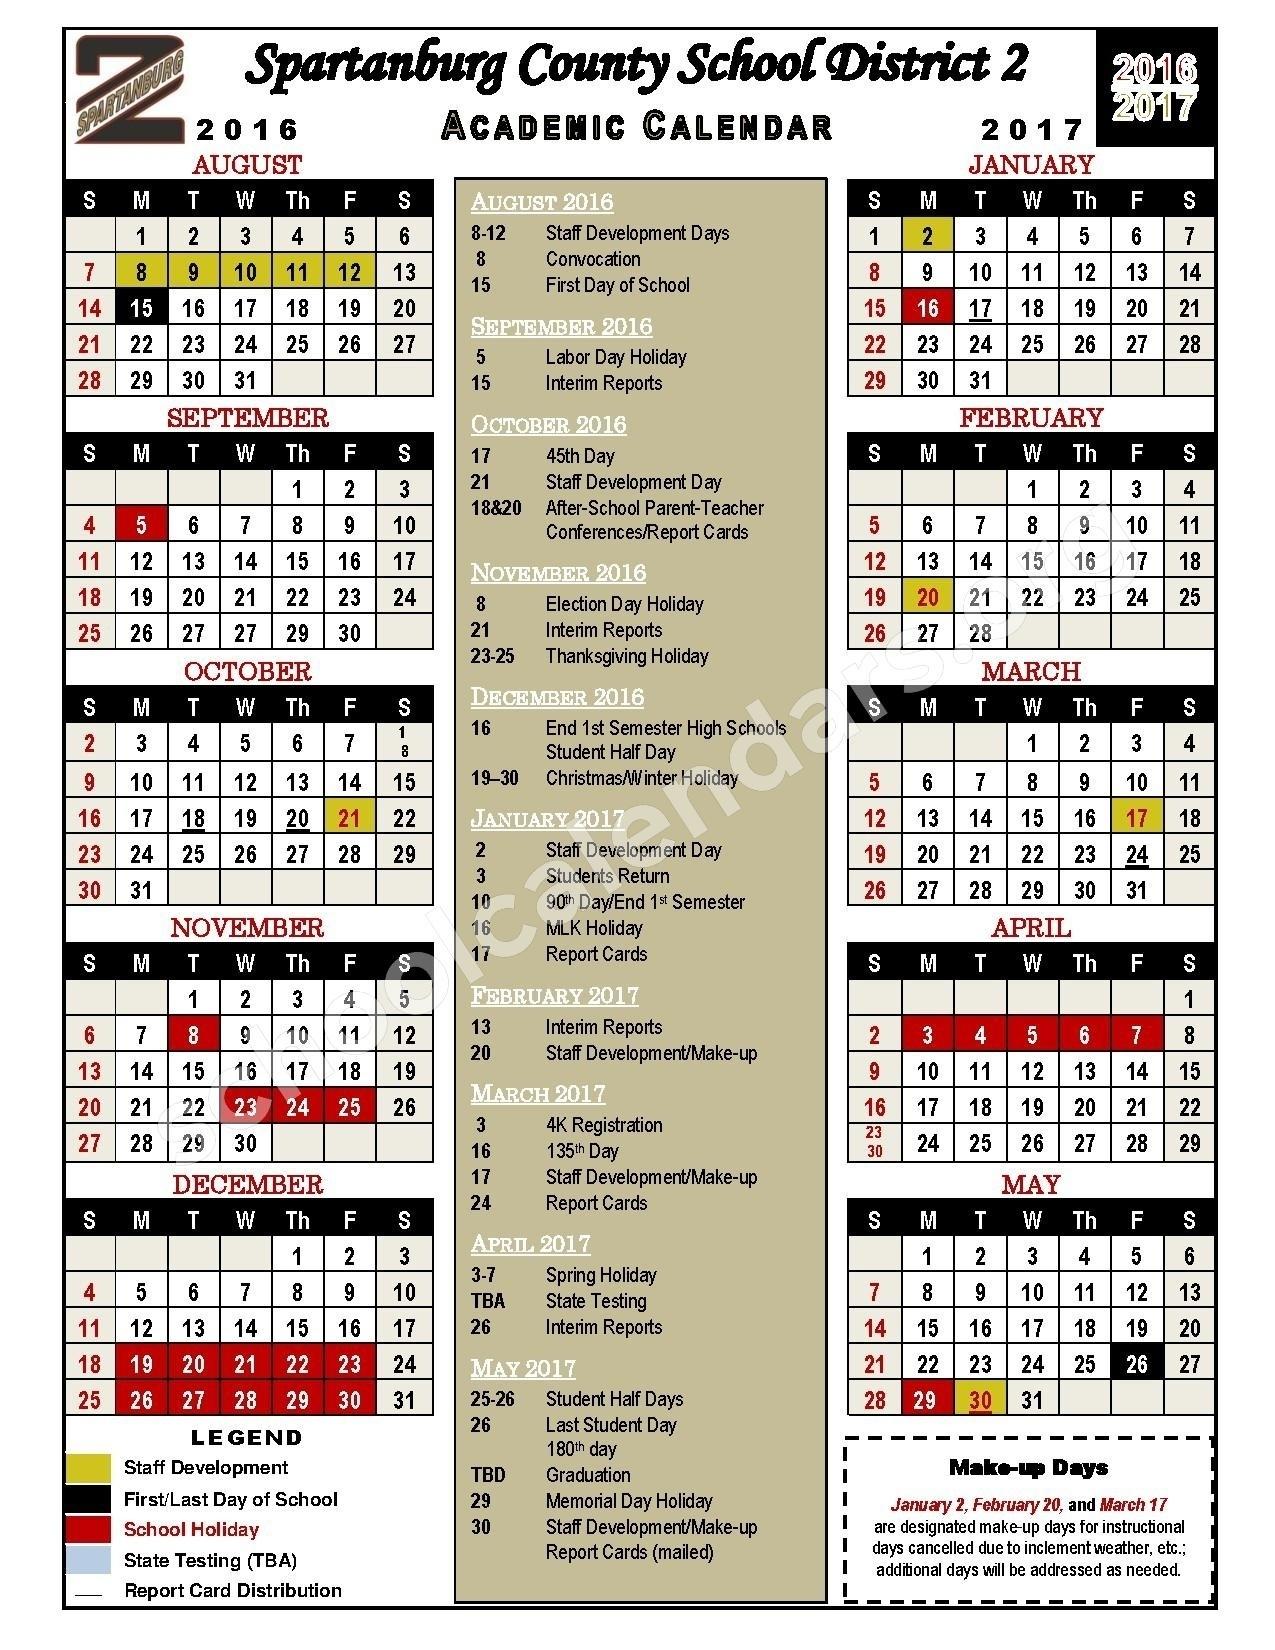 Incredible District 2 School Calendar • Printable Blank Calendar_Spartanburg District 6 School Calendar